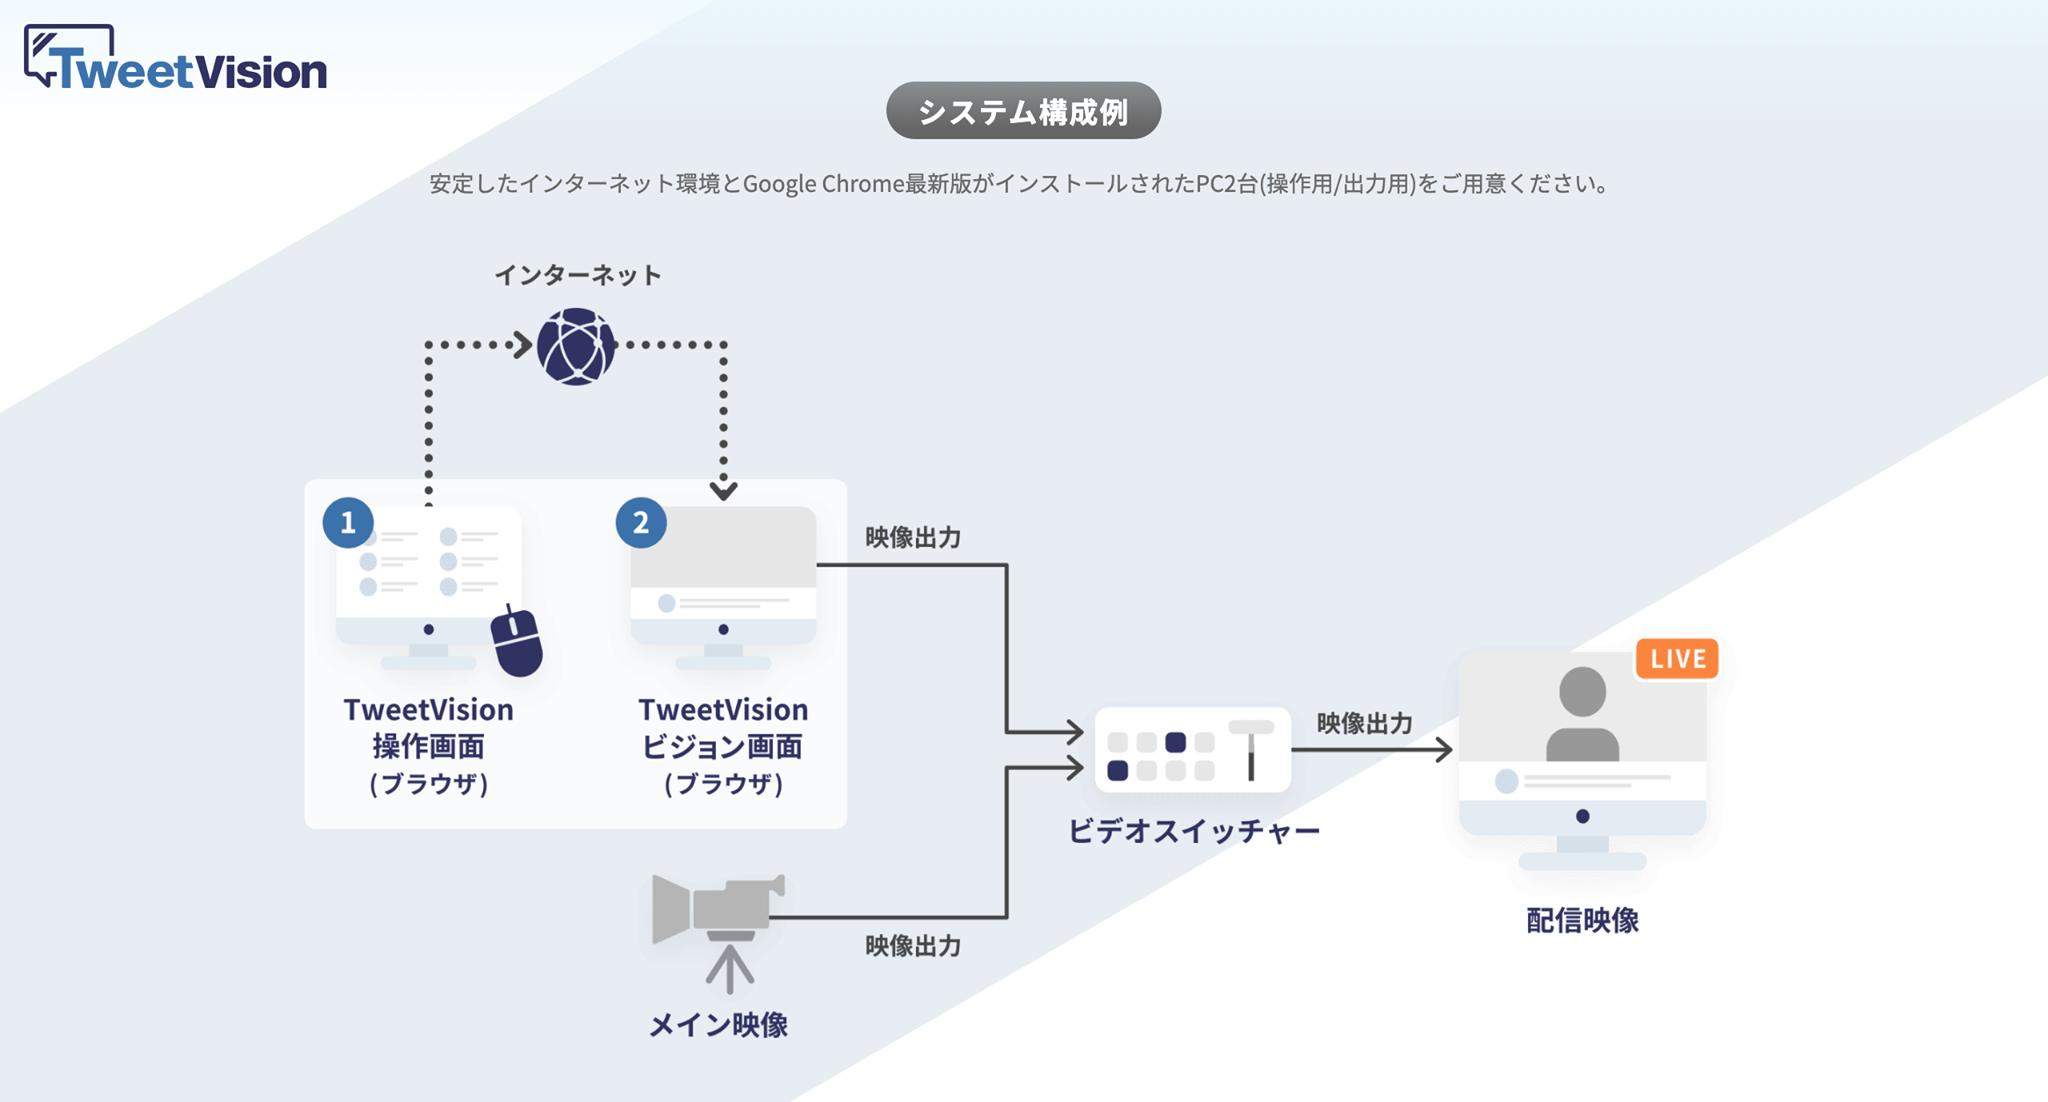 「TweetVision」フロー図